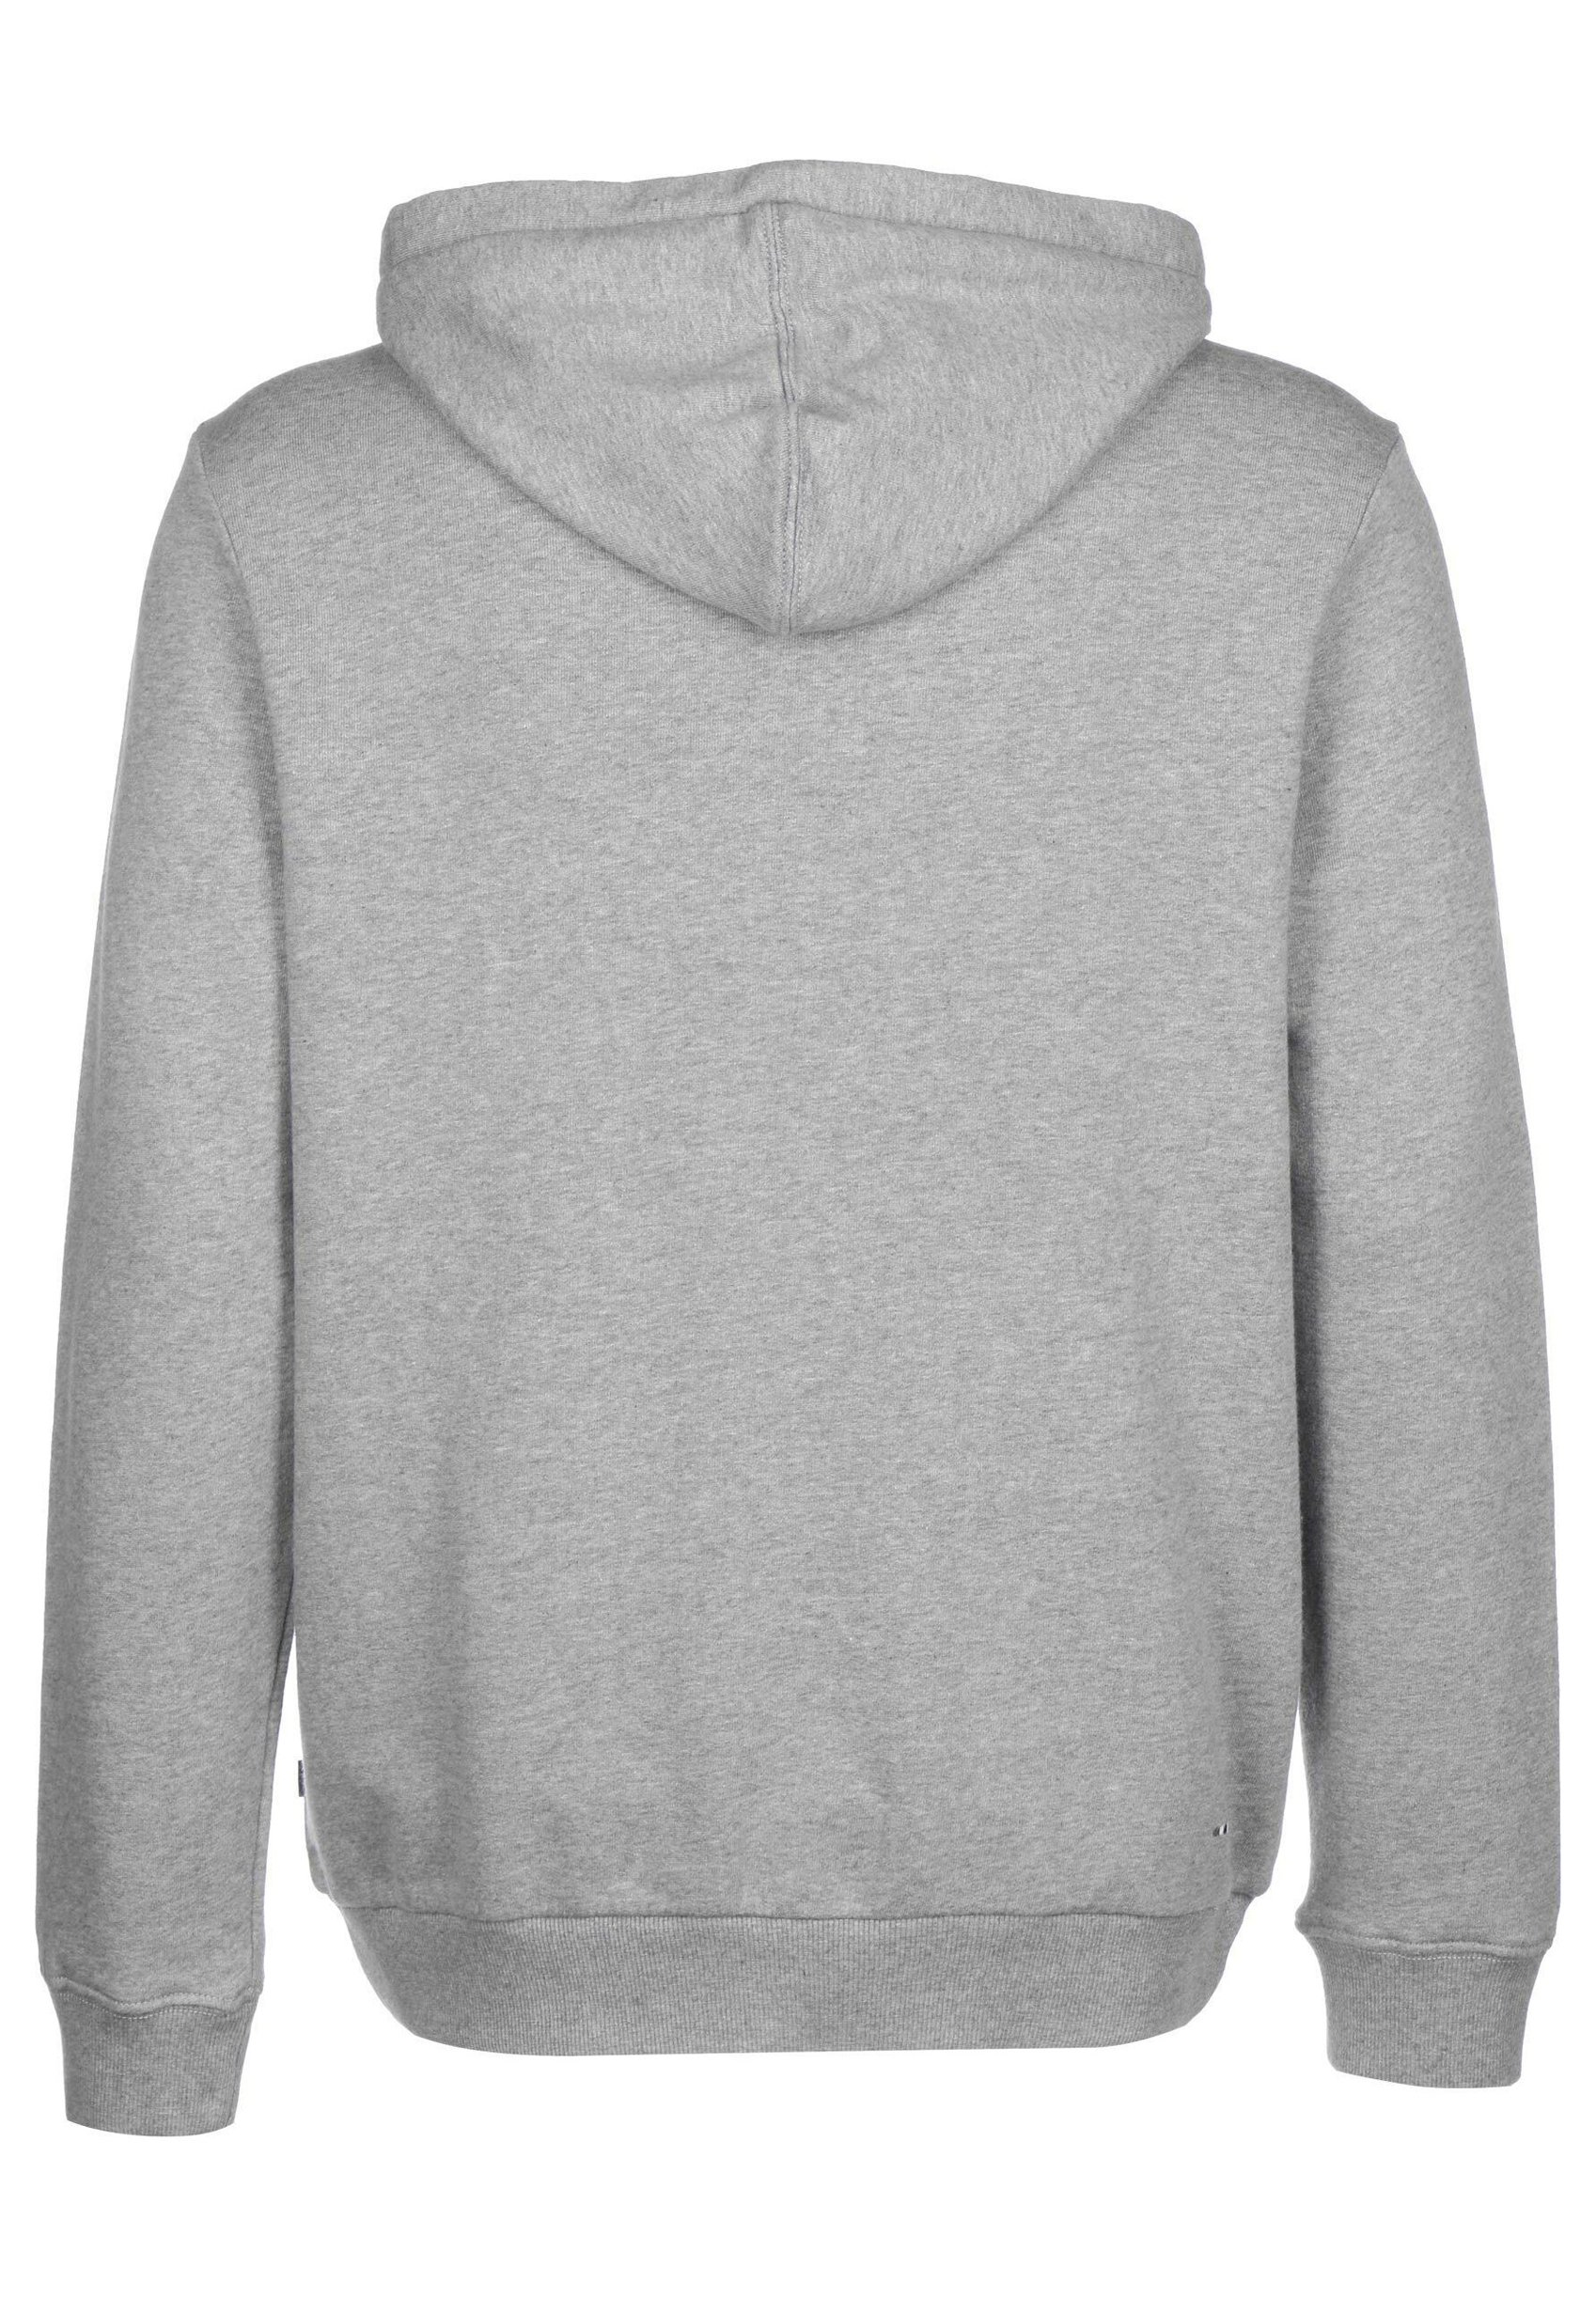 Napapijri BURGEE - Sweat à capuche - med grey melange